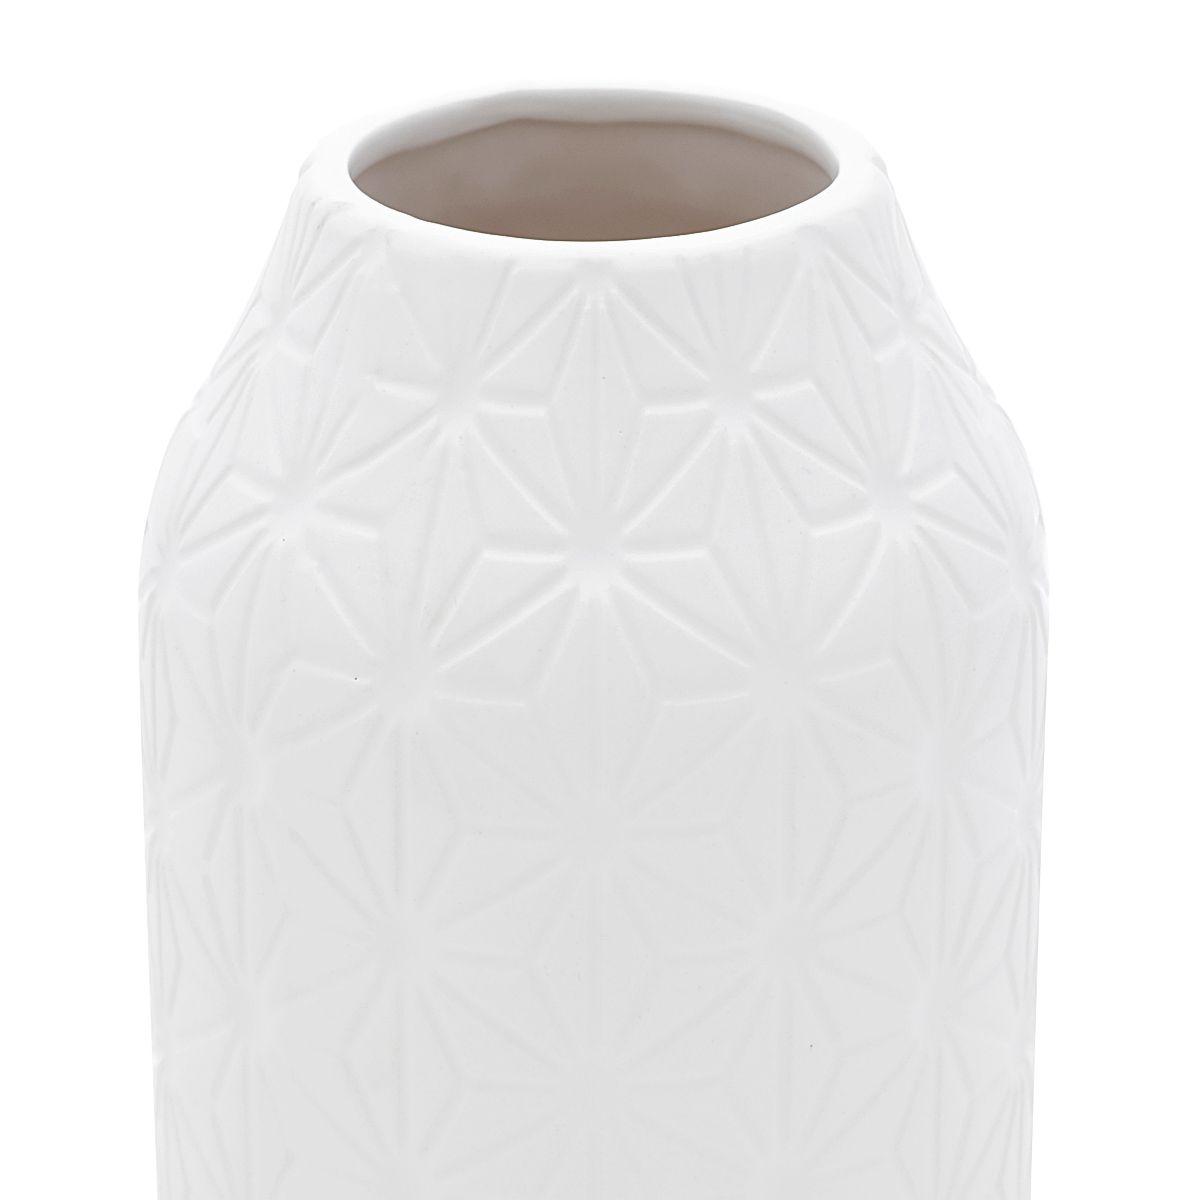 Vaso Decorativo Cerâmica Branco 11x23cm